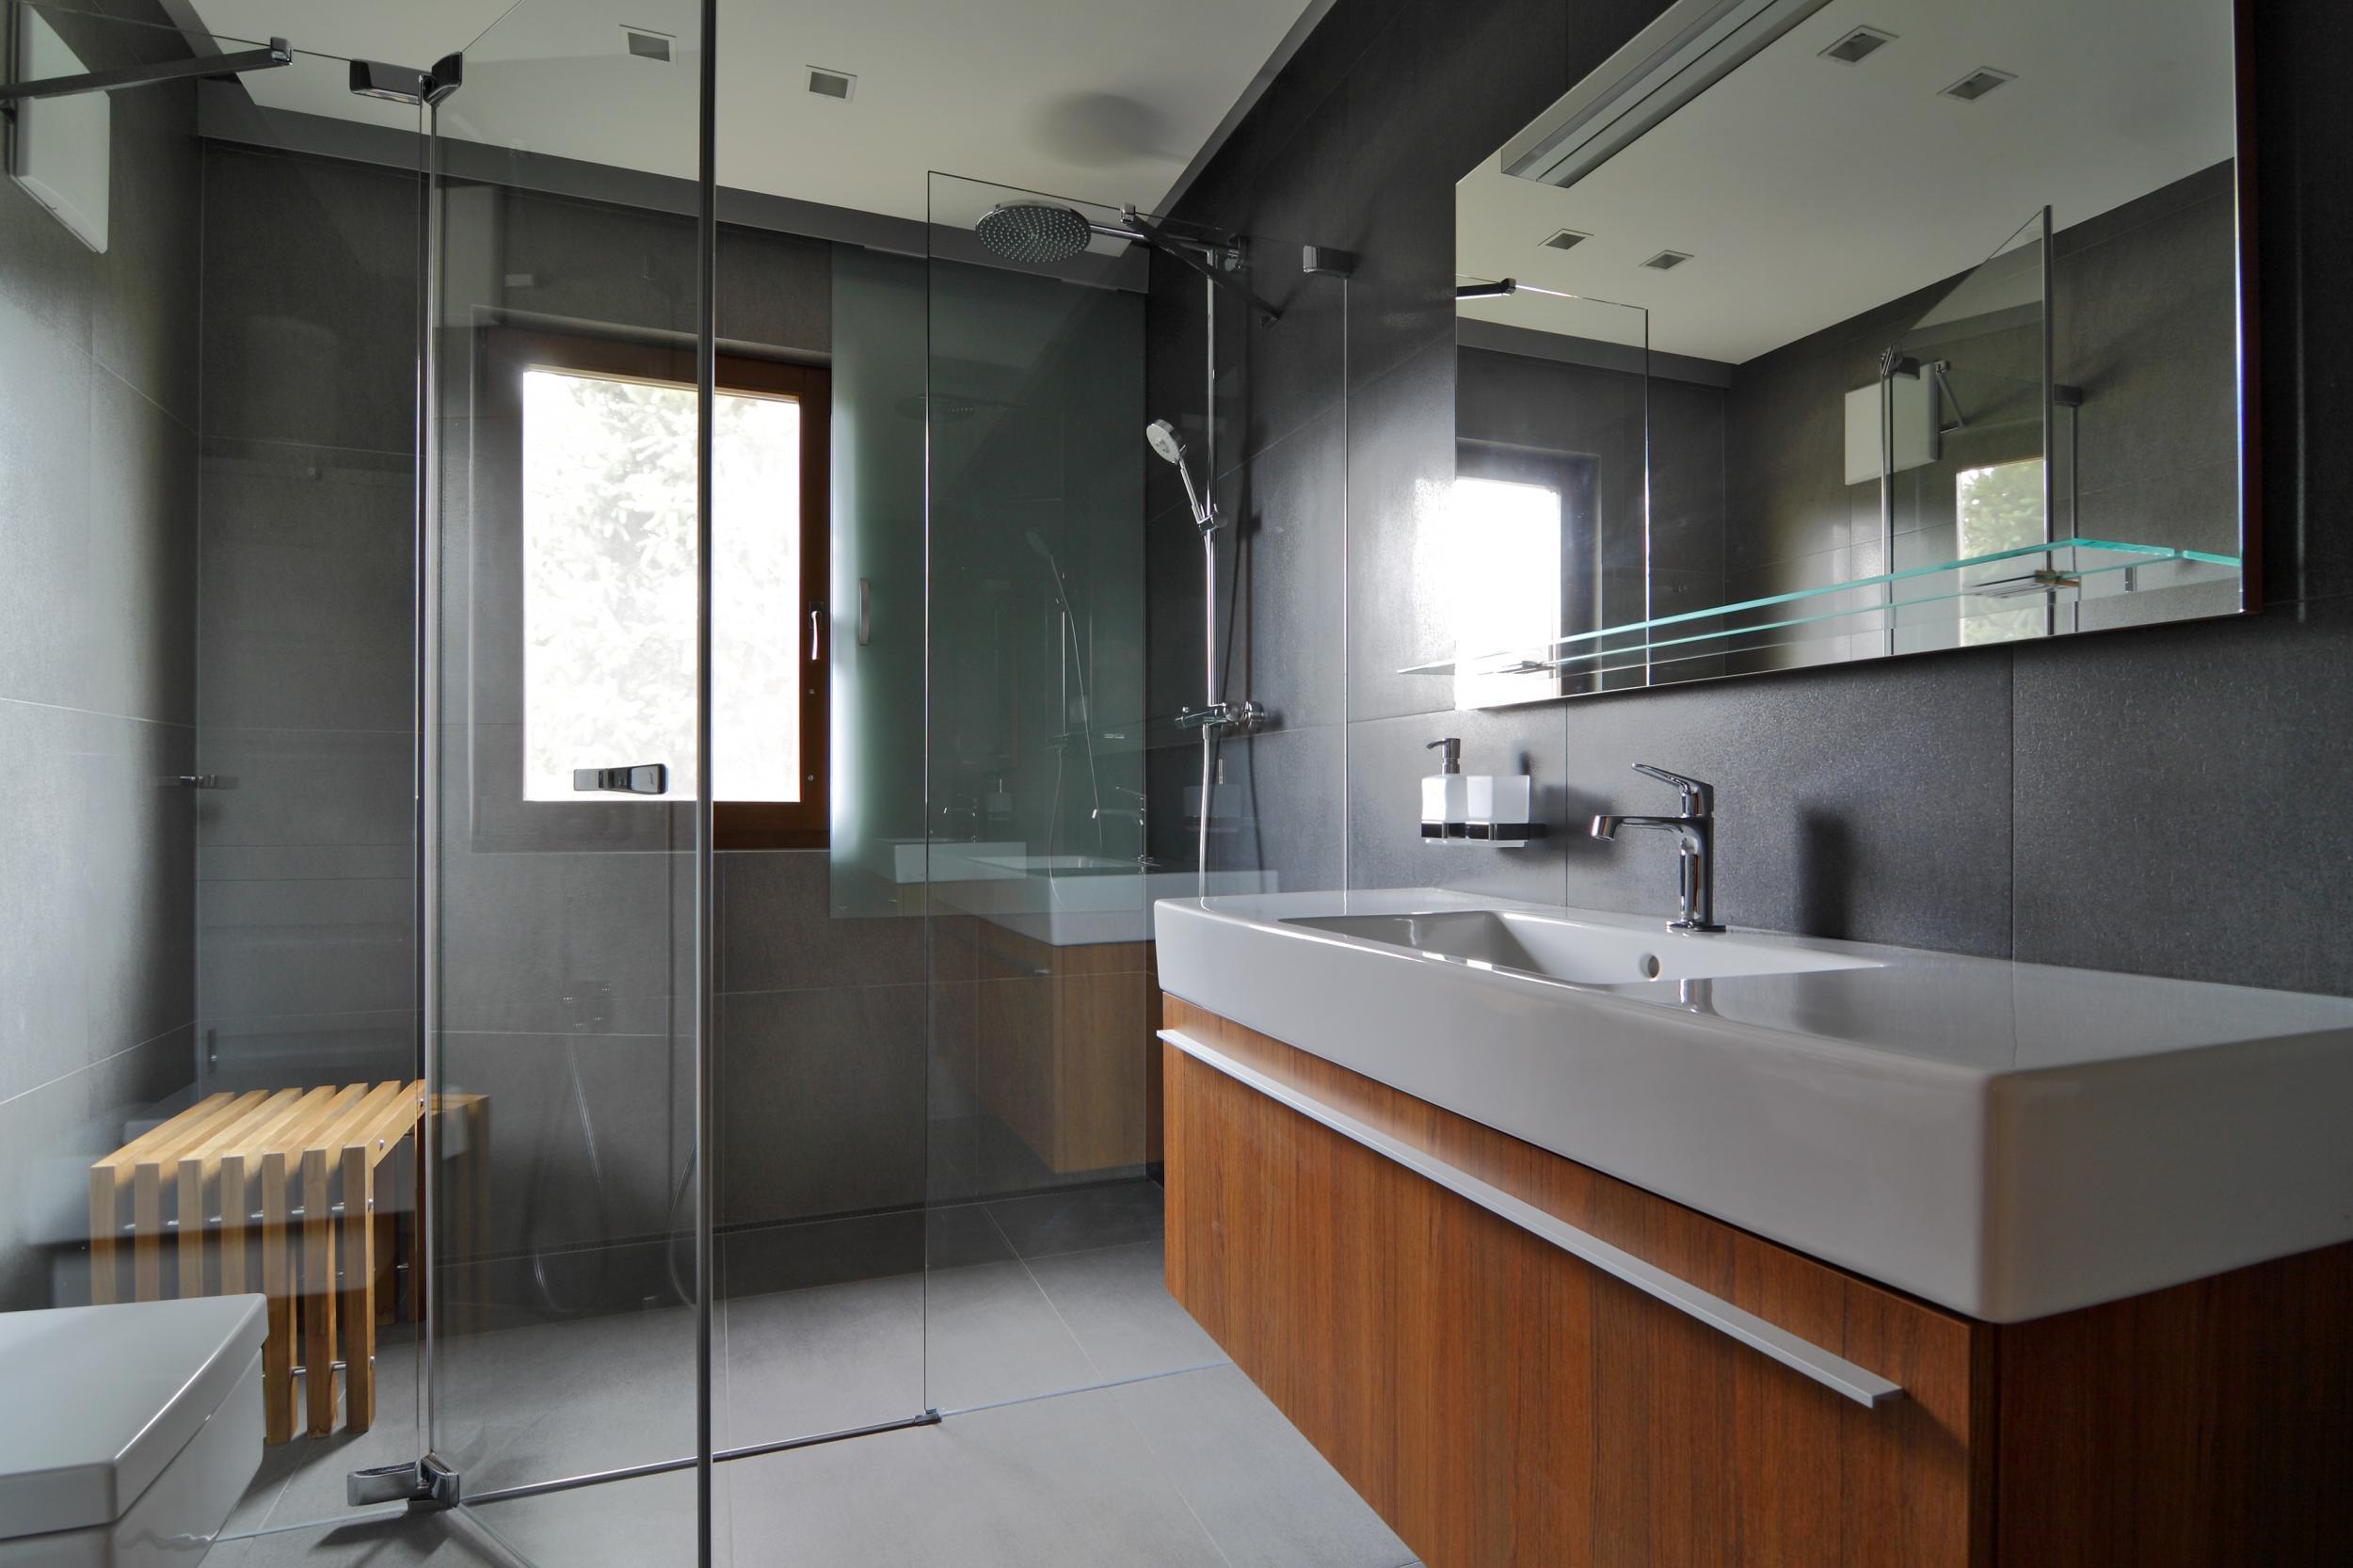 badezimmer | rules architekten, Hause ideen